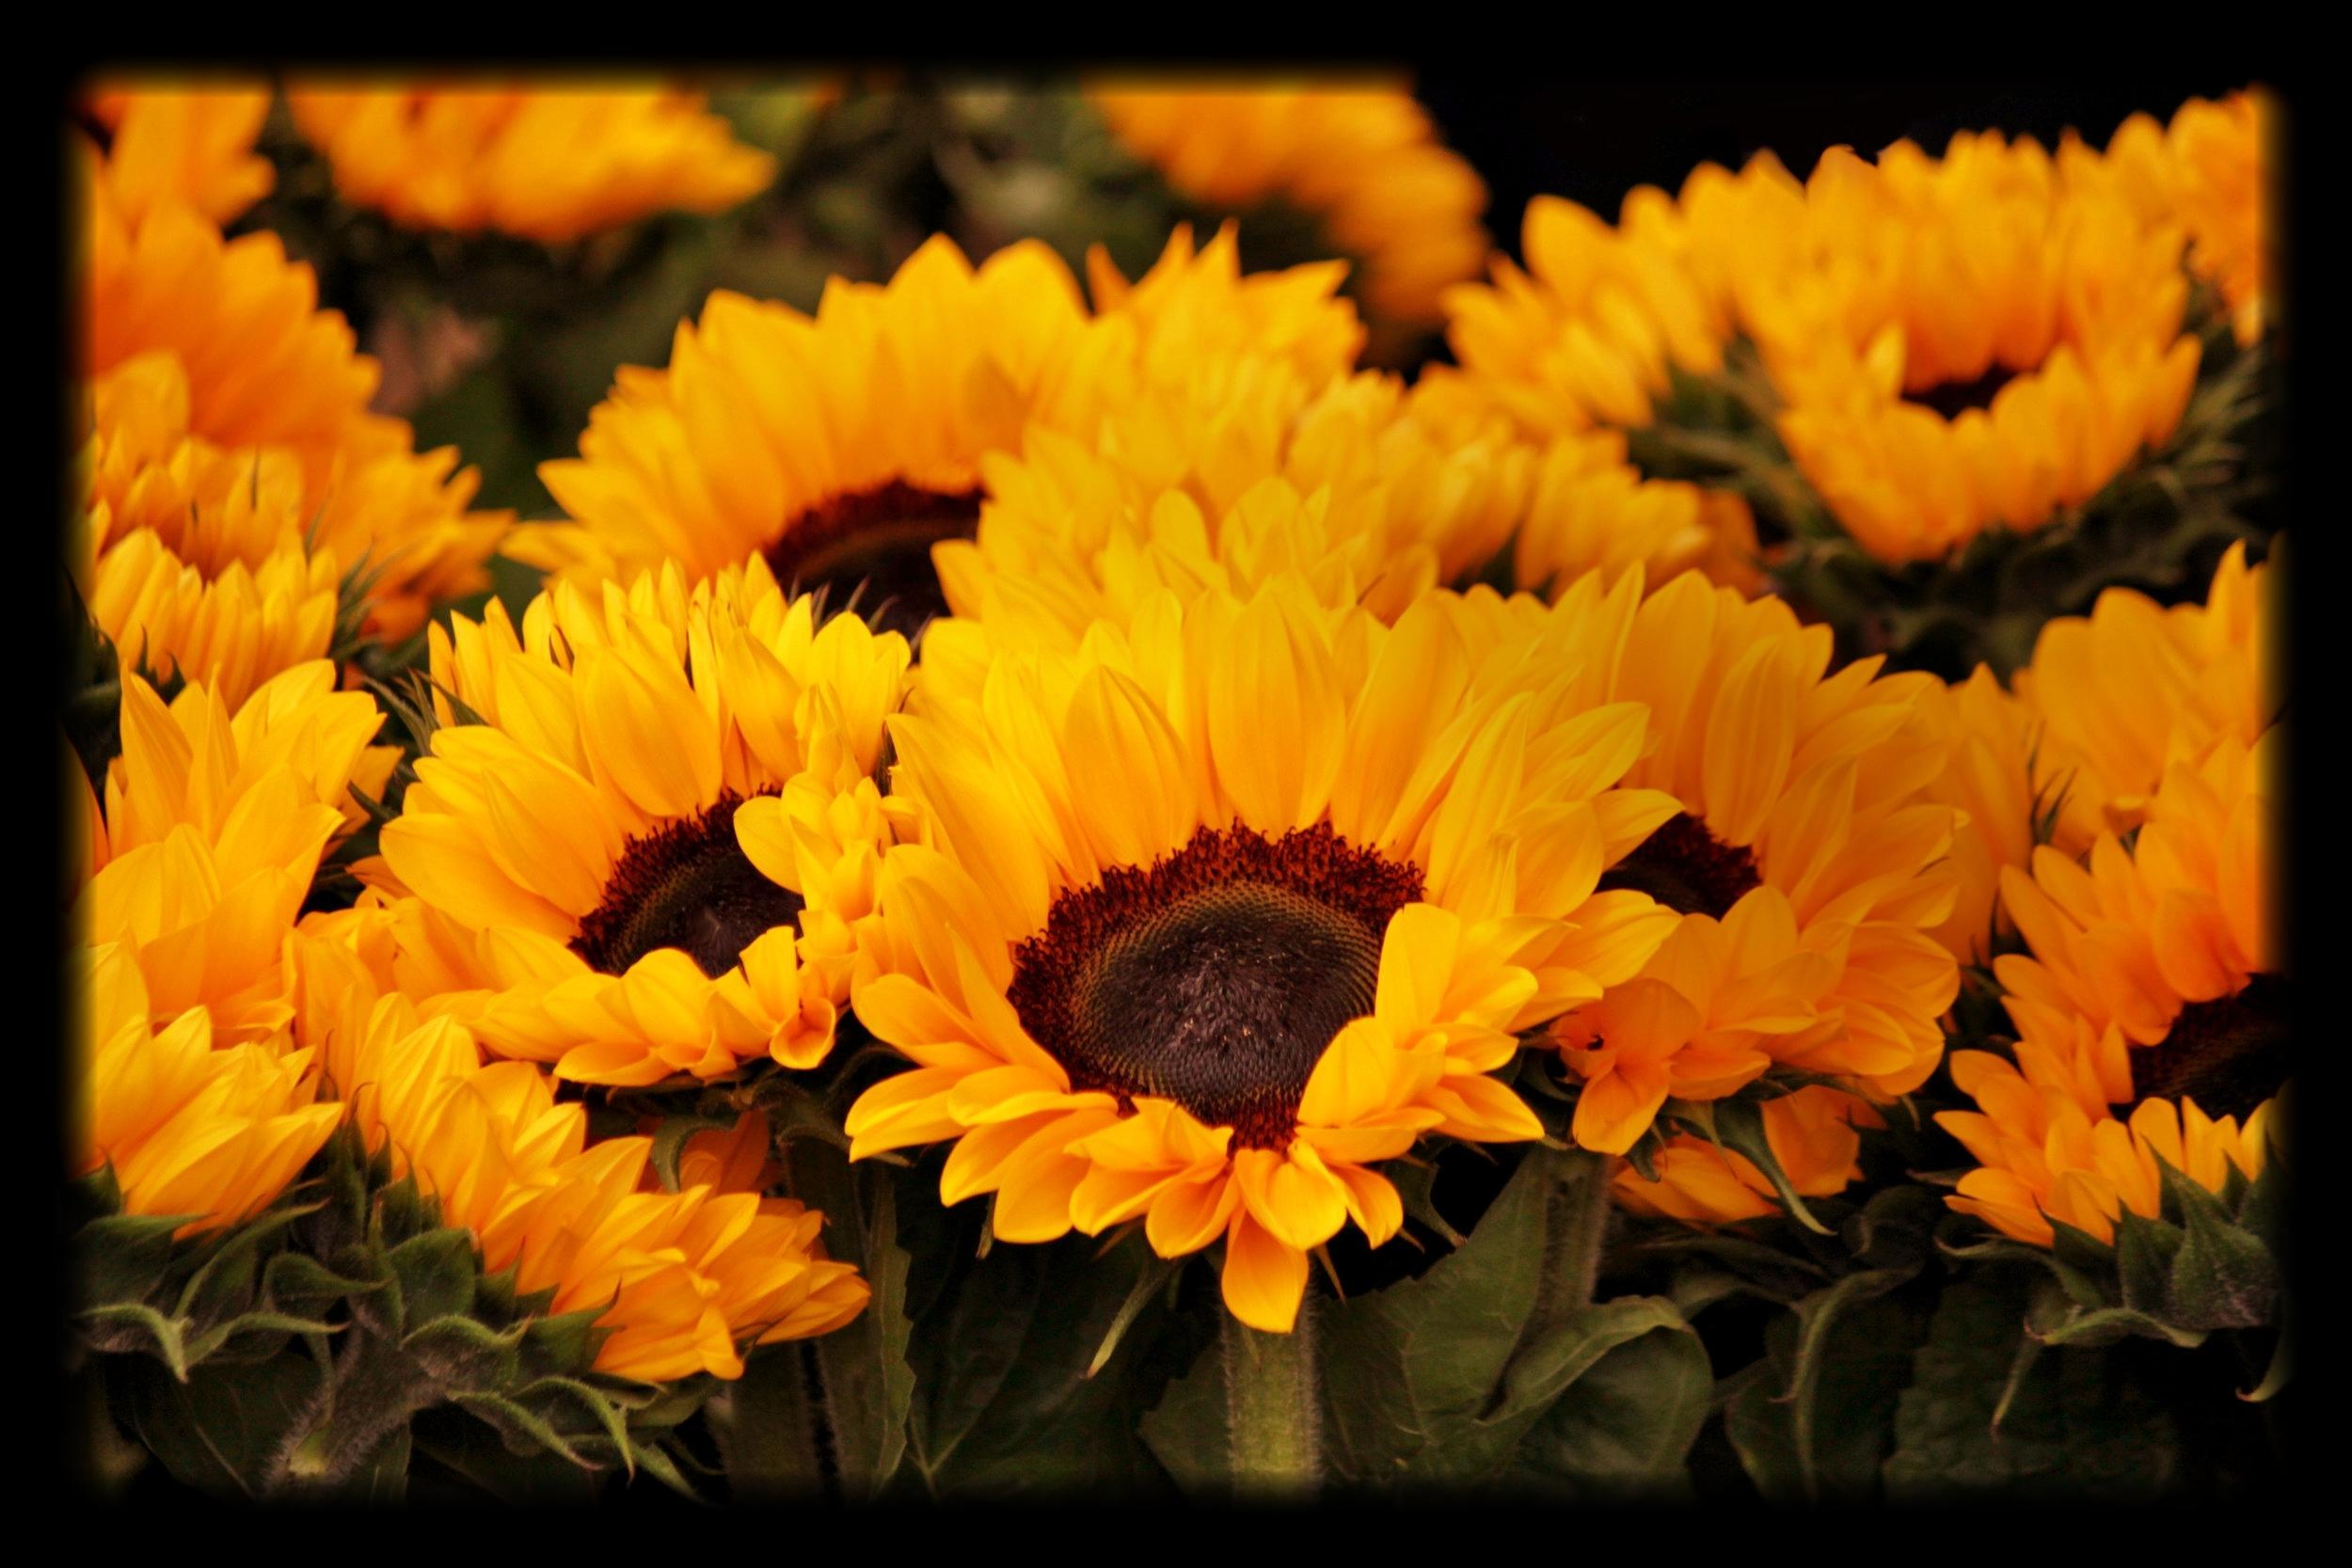 bloom-blur-close-up-54267.jpg